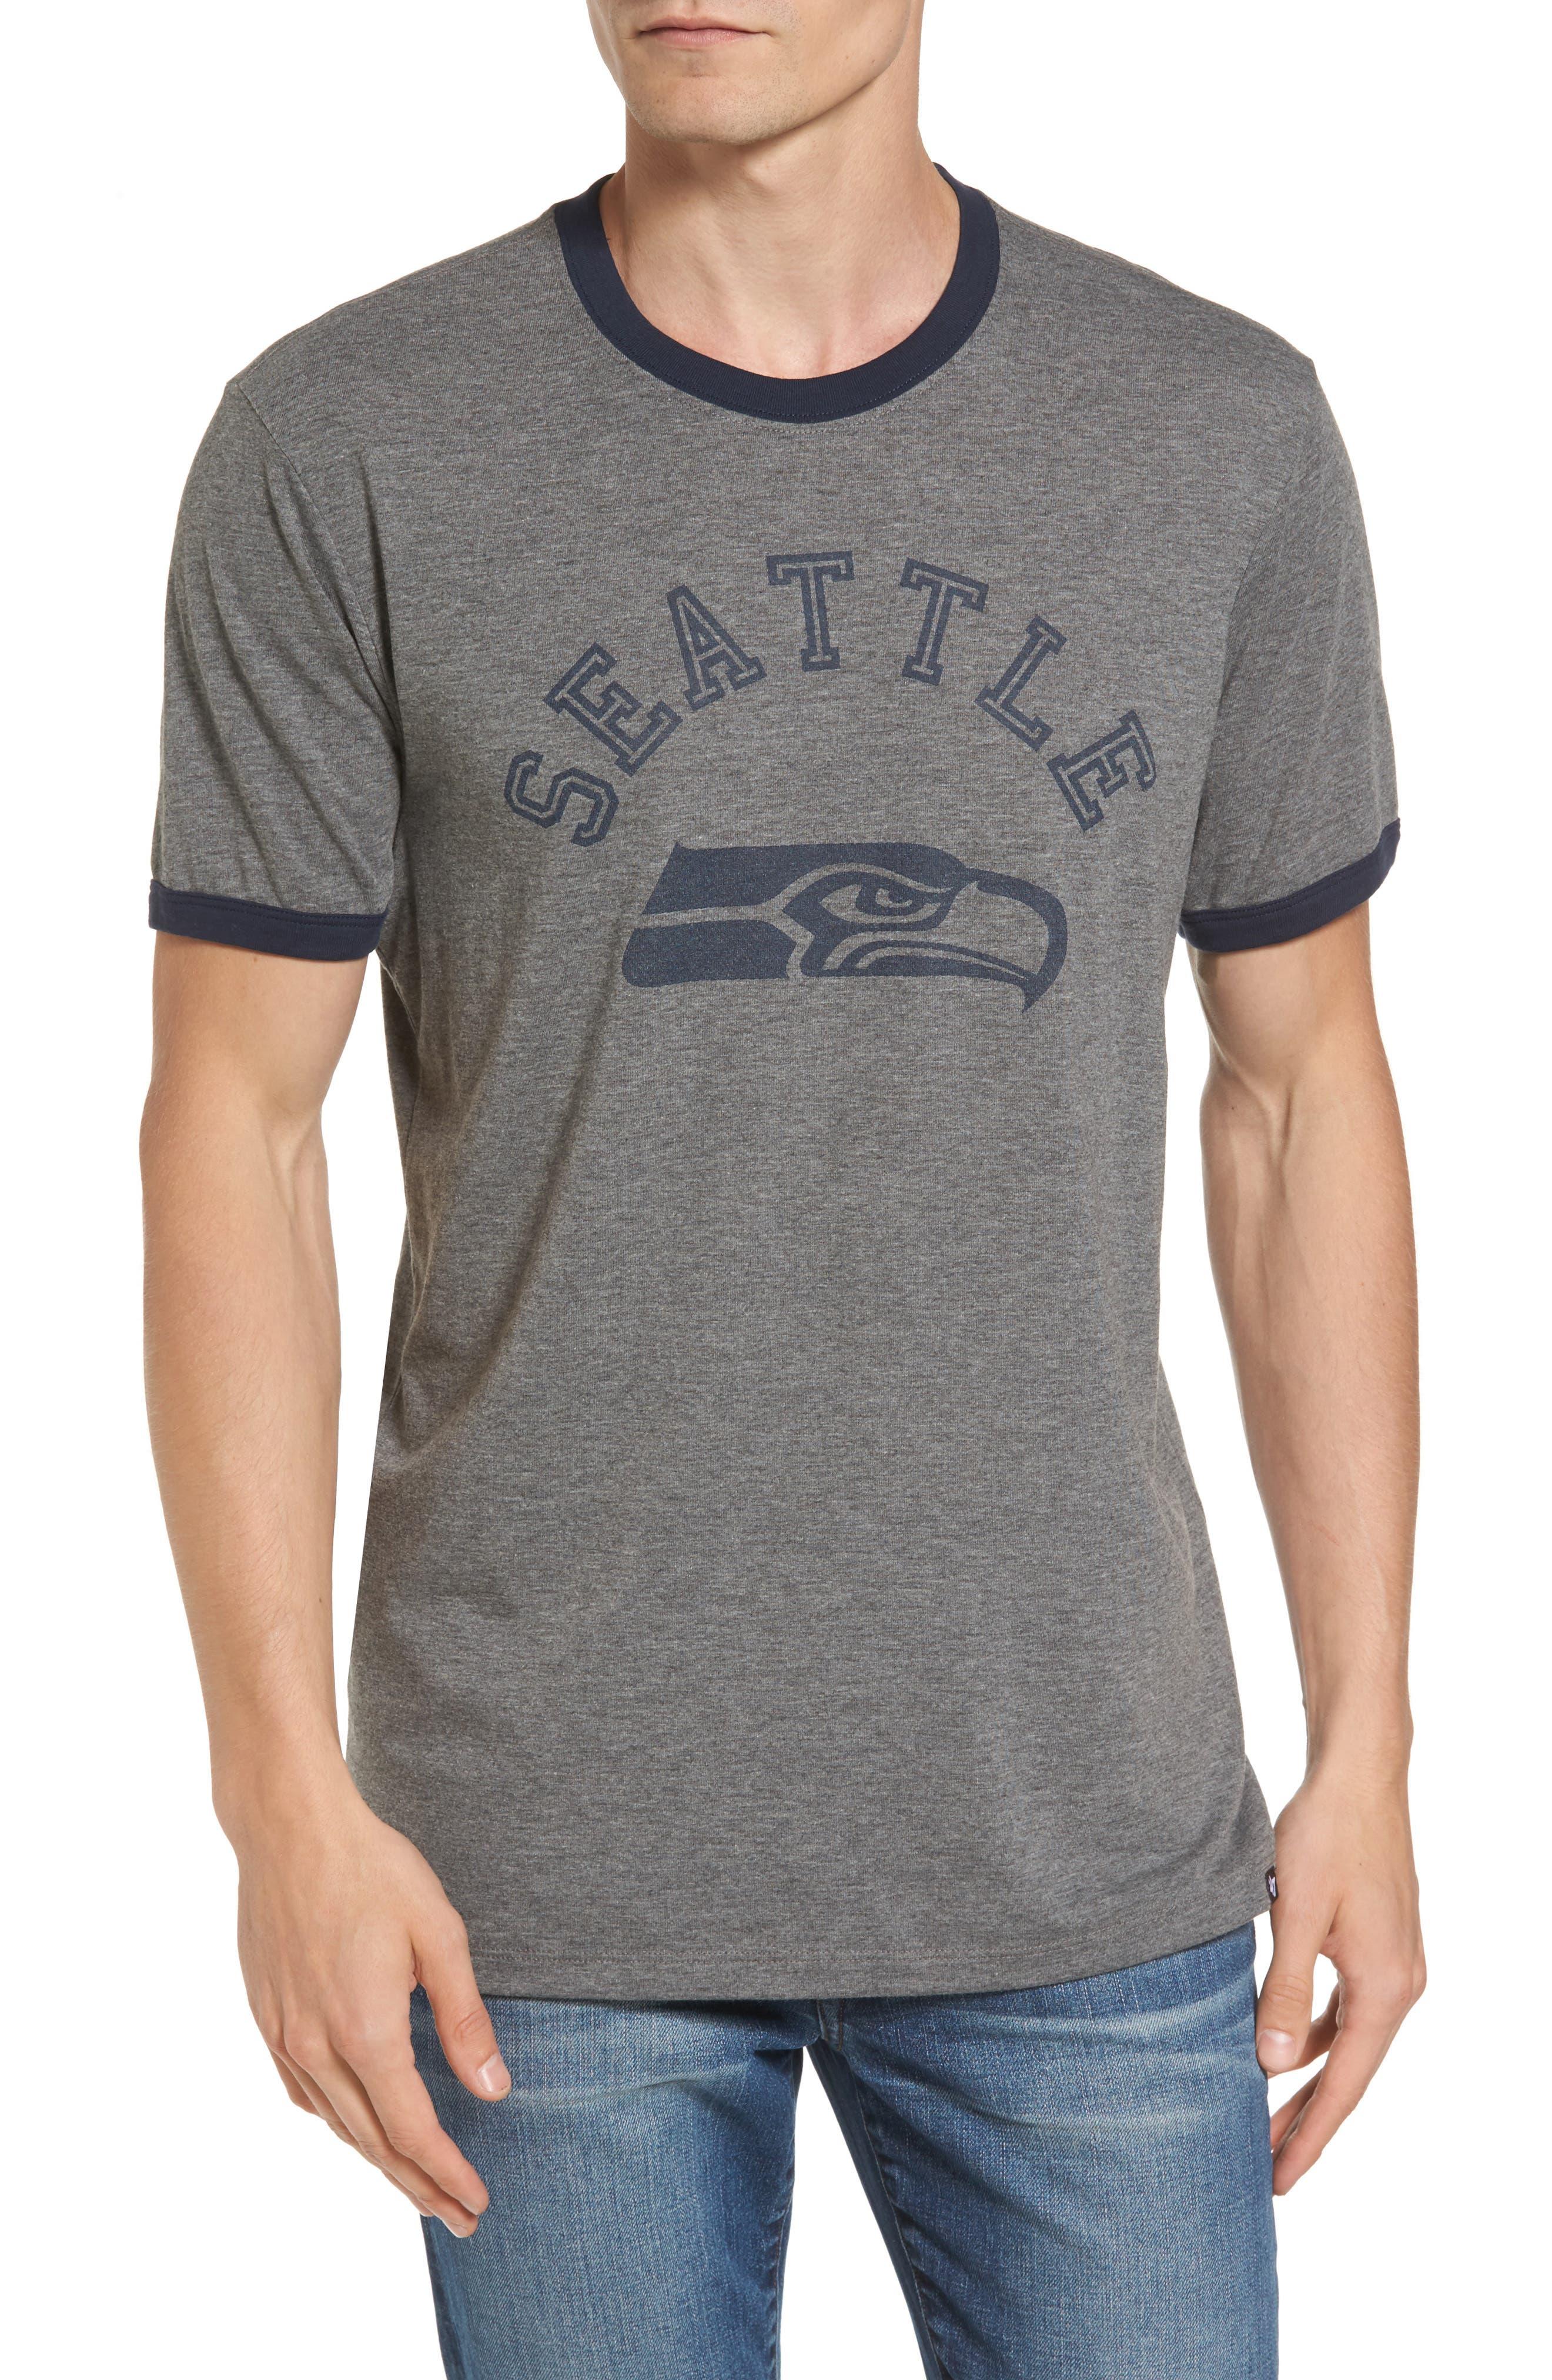 Main Image - '47 Seattle Seahawks Ringer T-Shirt